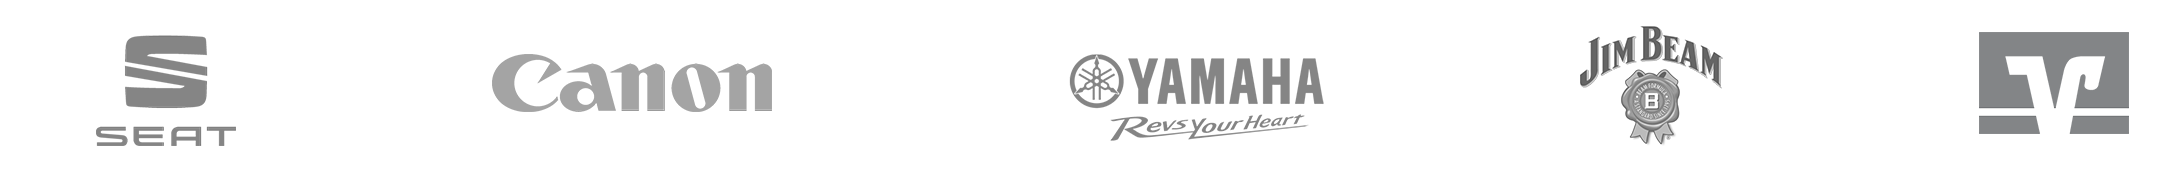 gybe_logos_stripe8_web_181026